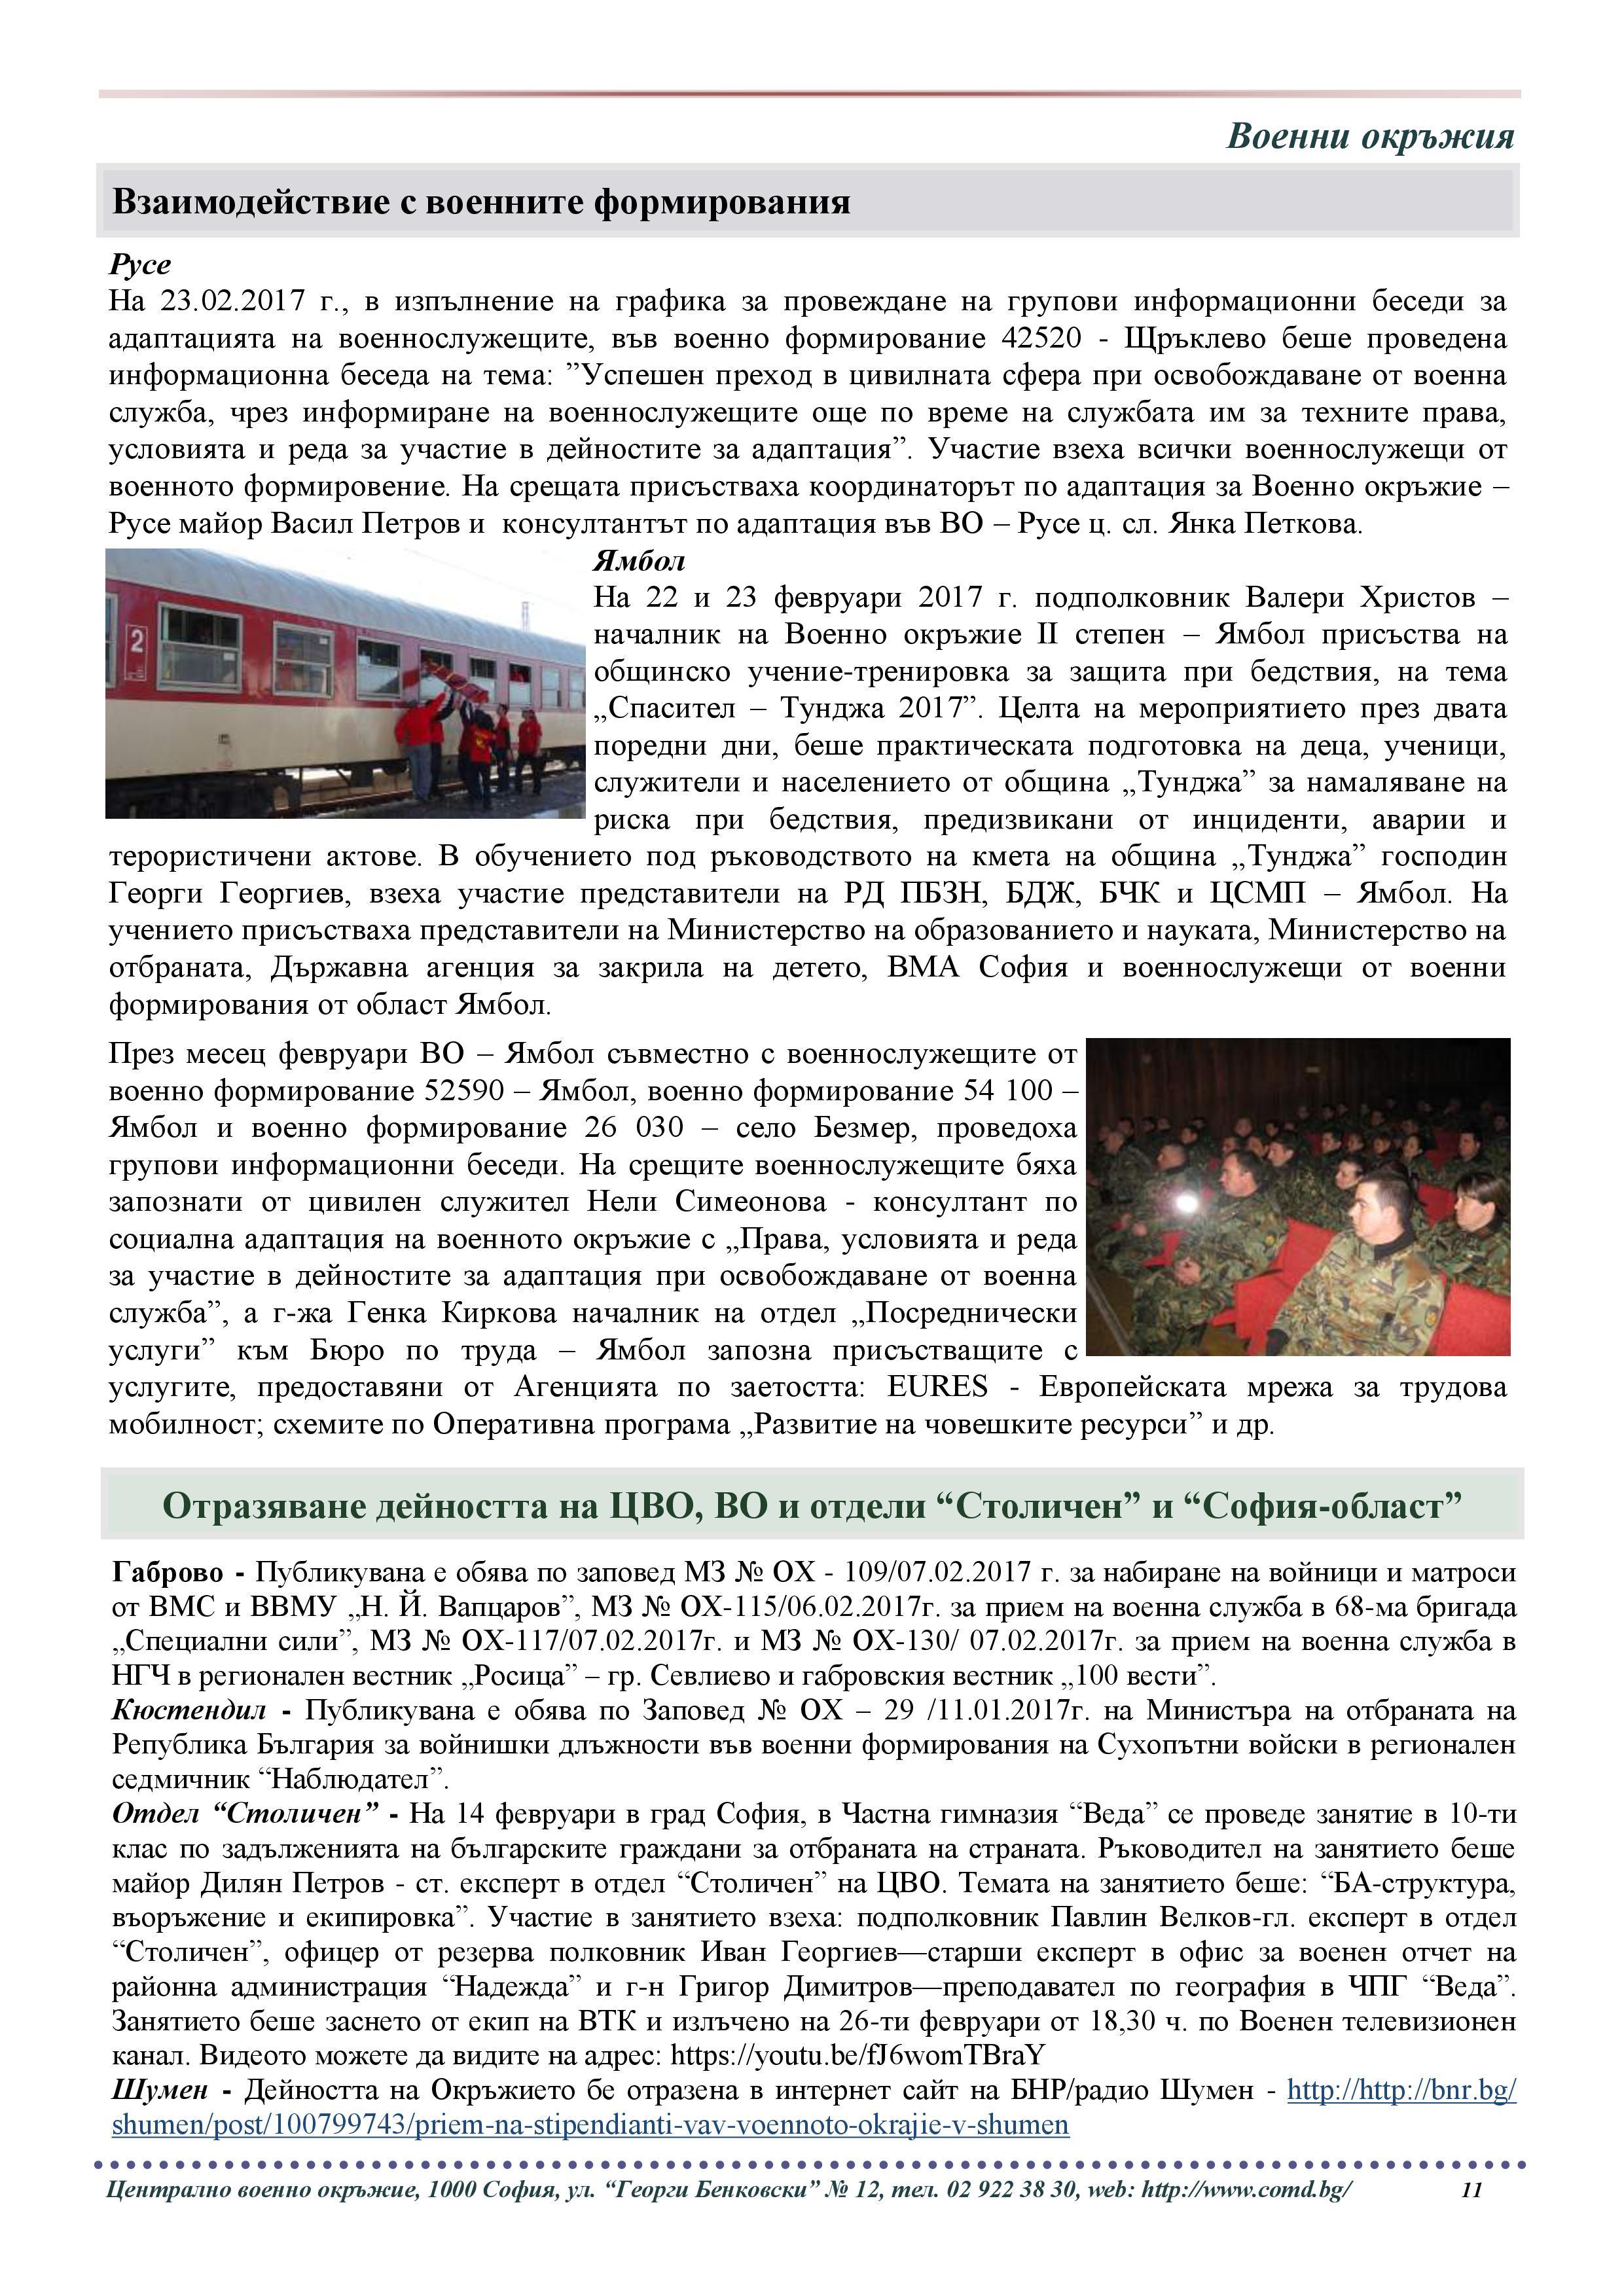 http://armymedia.bg/wp-content/uploads/2015/06/IB_2_2017g.compressed-za-izpra6tane-22.03.2017.page11.jpg